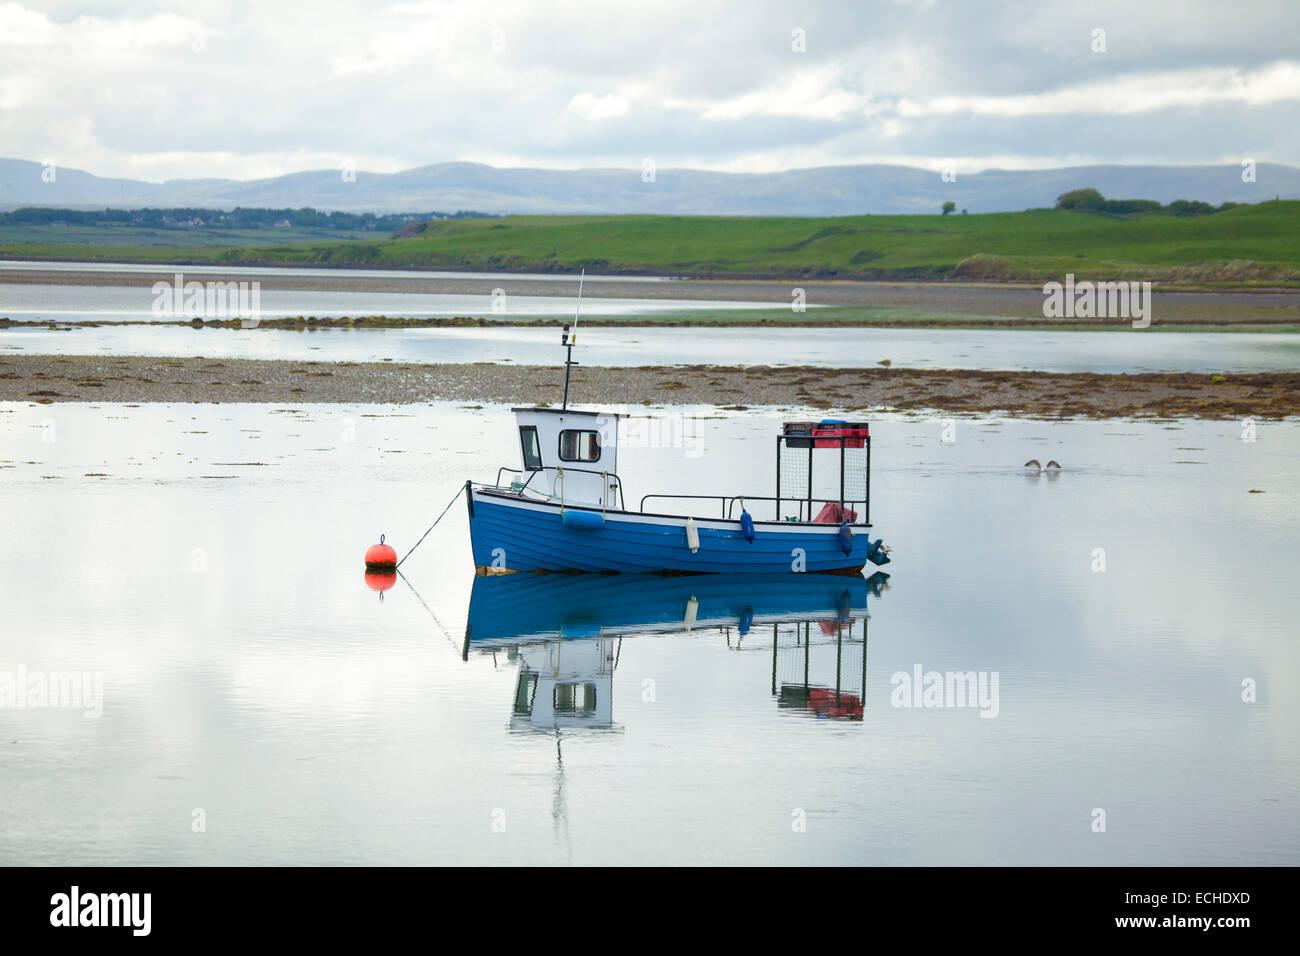 Reflection of lobster fishing boat moored in Killala Harbour. County Mayo, Ireland. - Stock Image